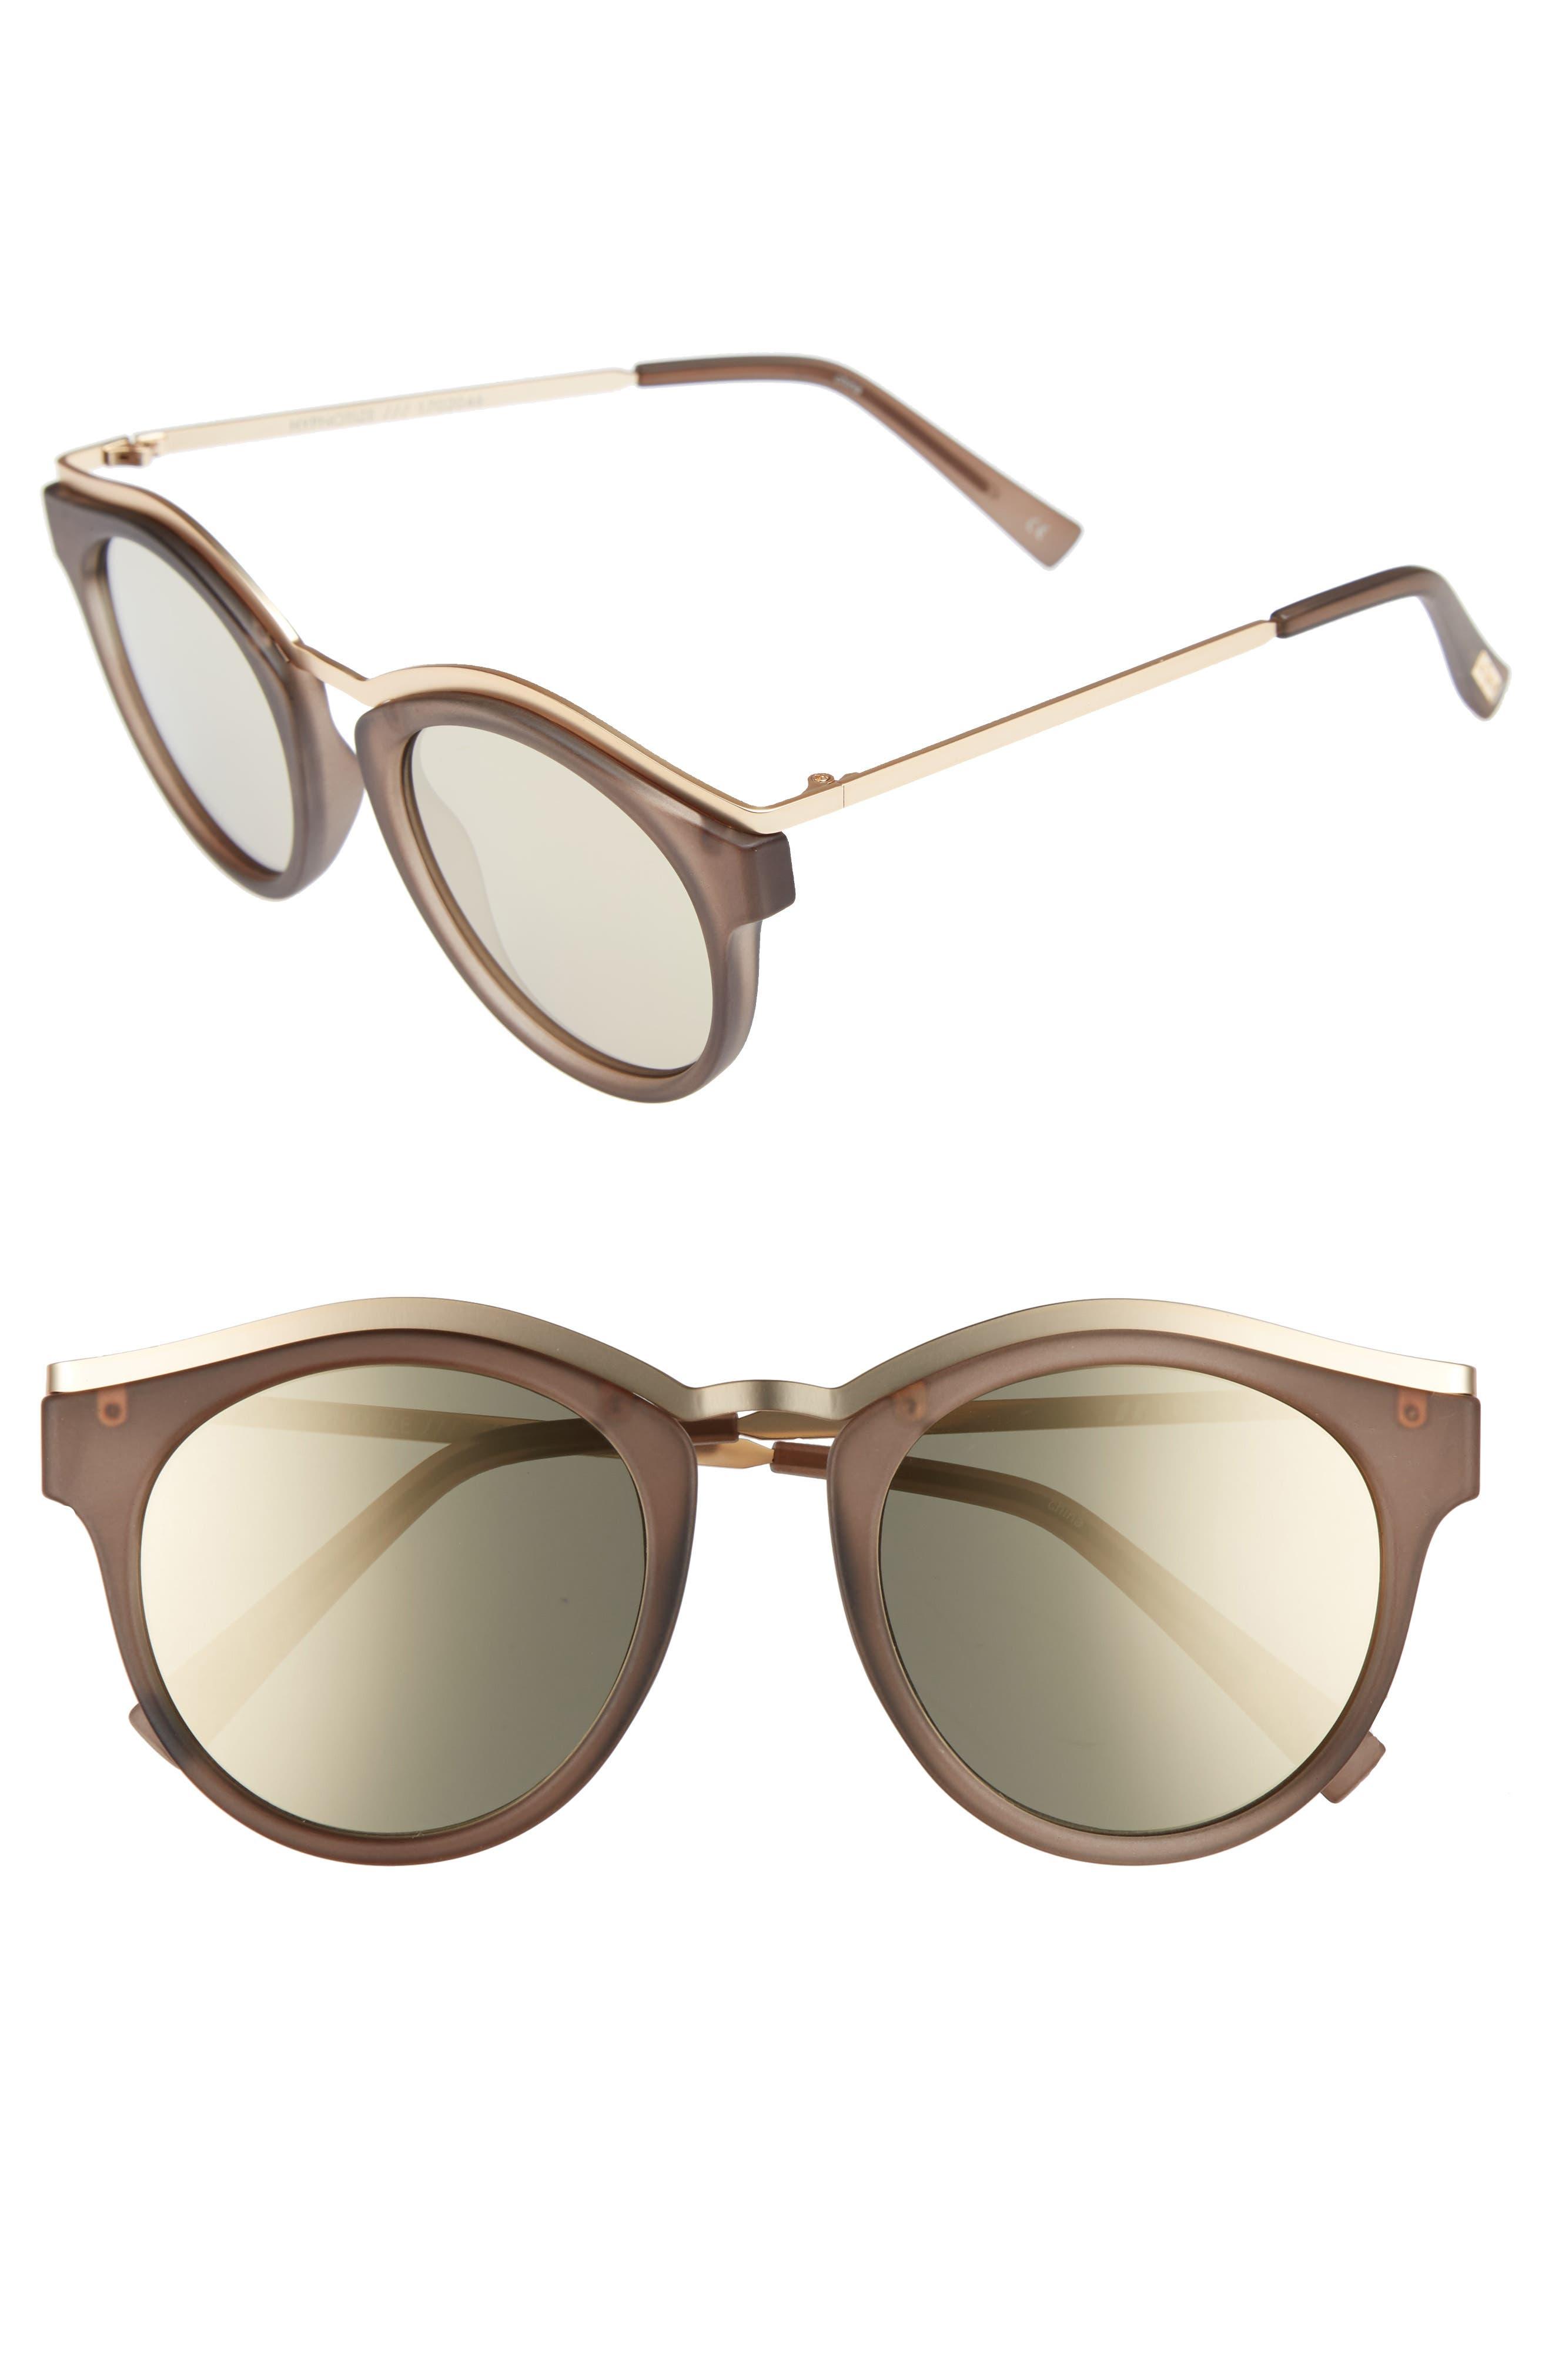 Alternate Image 1 Selected - Le Specs Hypnotize 50mm Round Sunglasses